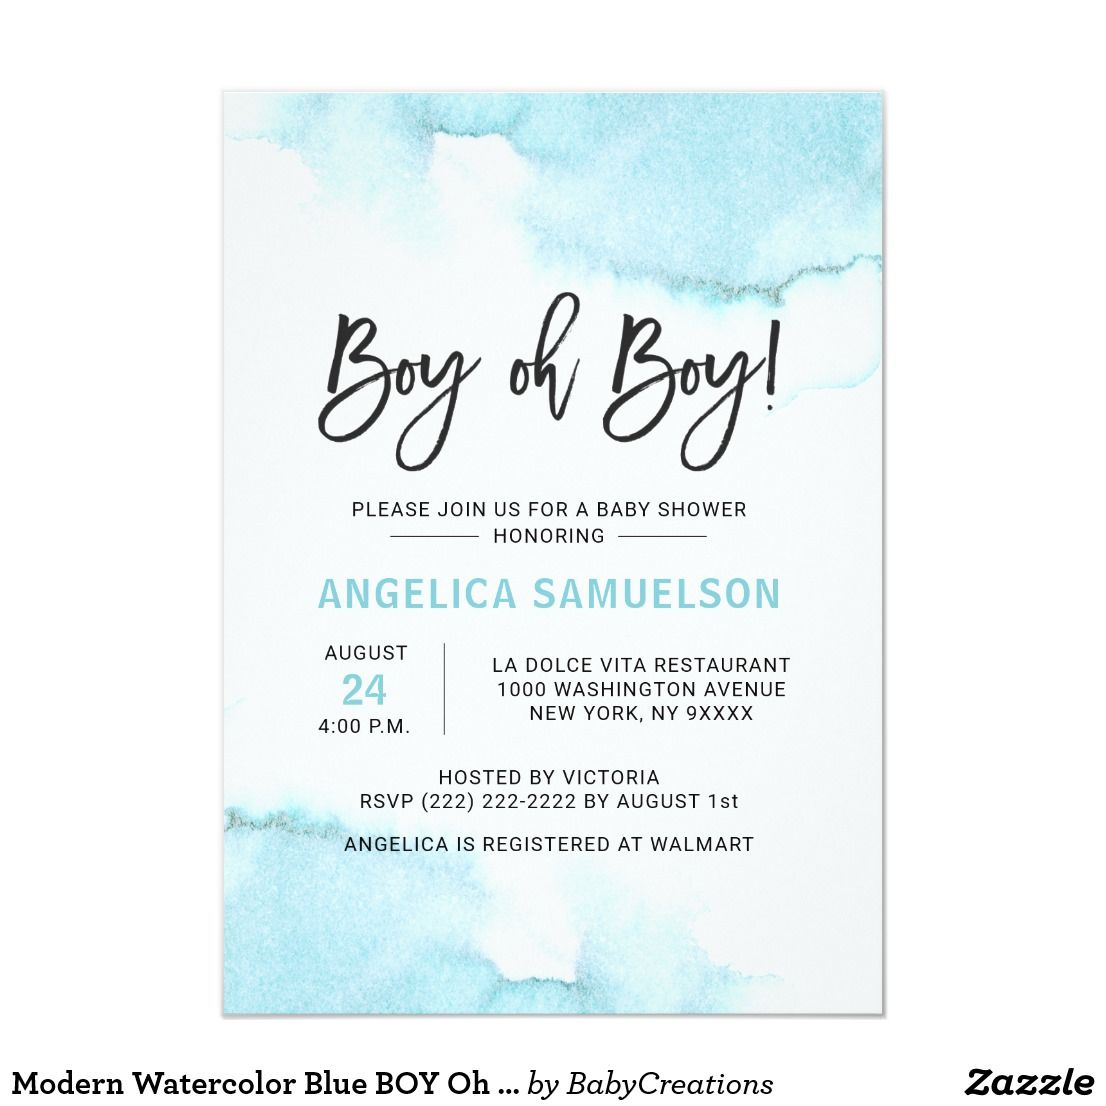 Modern Watercolor Blue Boy Oh Boy Baby Shower Invitation Zazzle Com Baby Shower Invitations For Boys Baby Boy Shower Baby Boy Shower Party